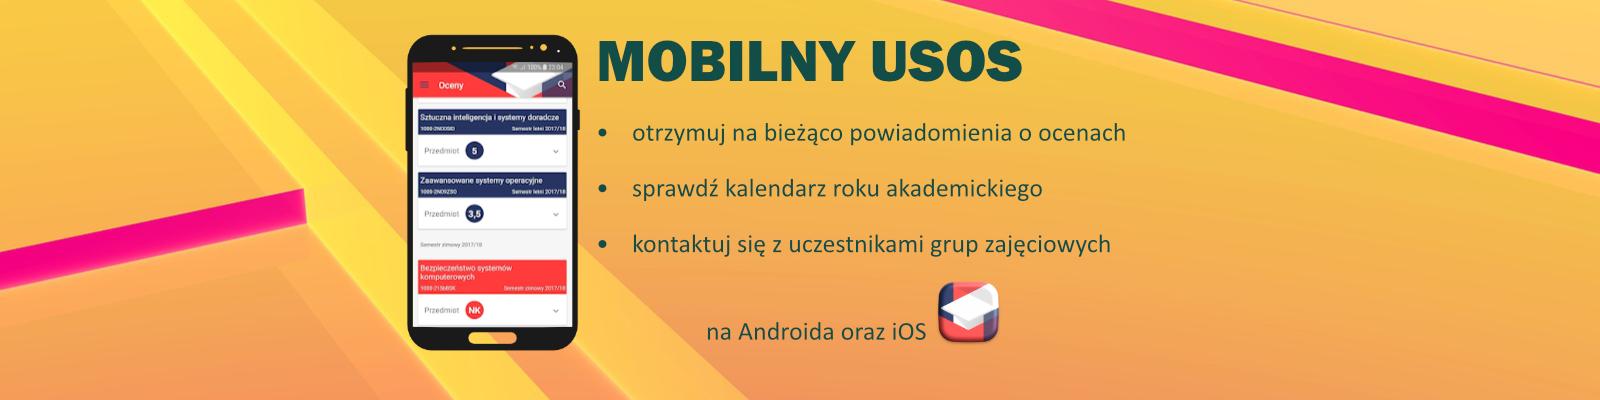 Mobilny USOS UMCS